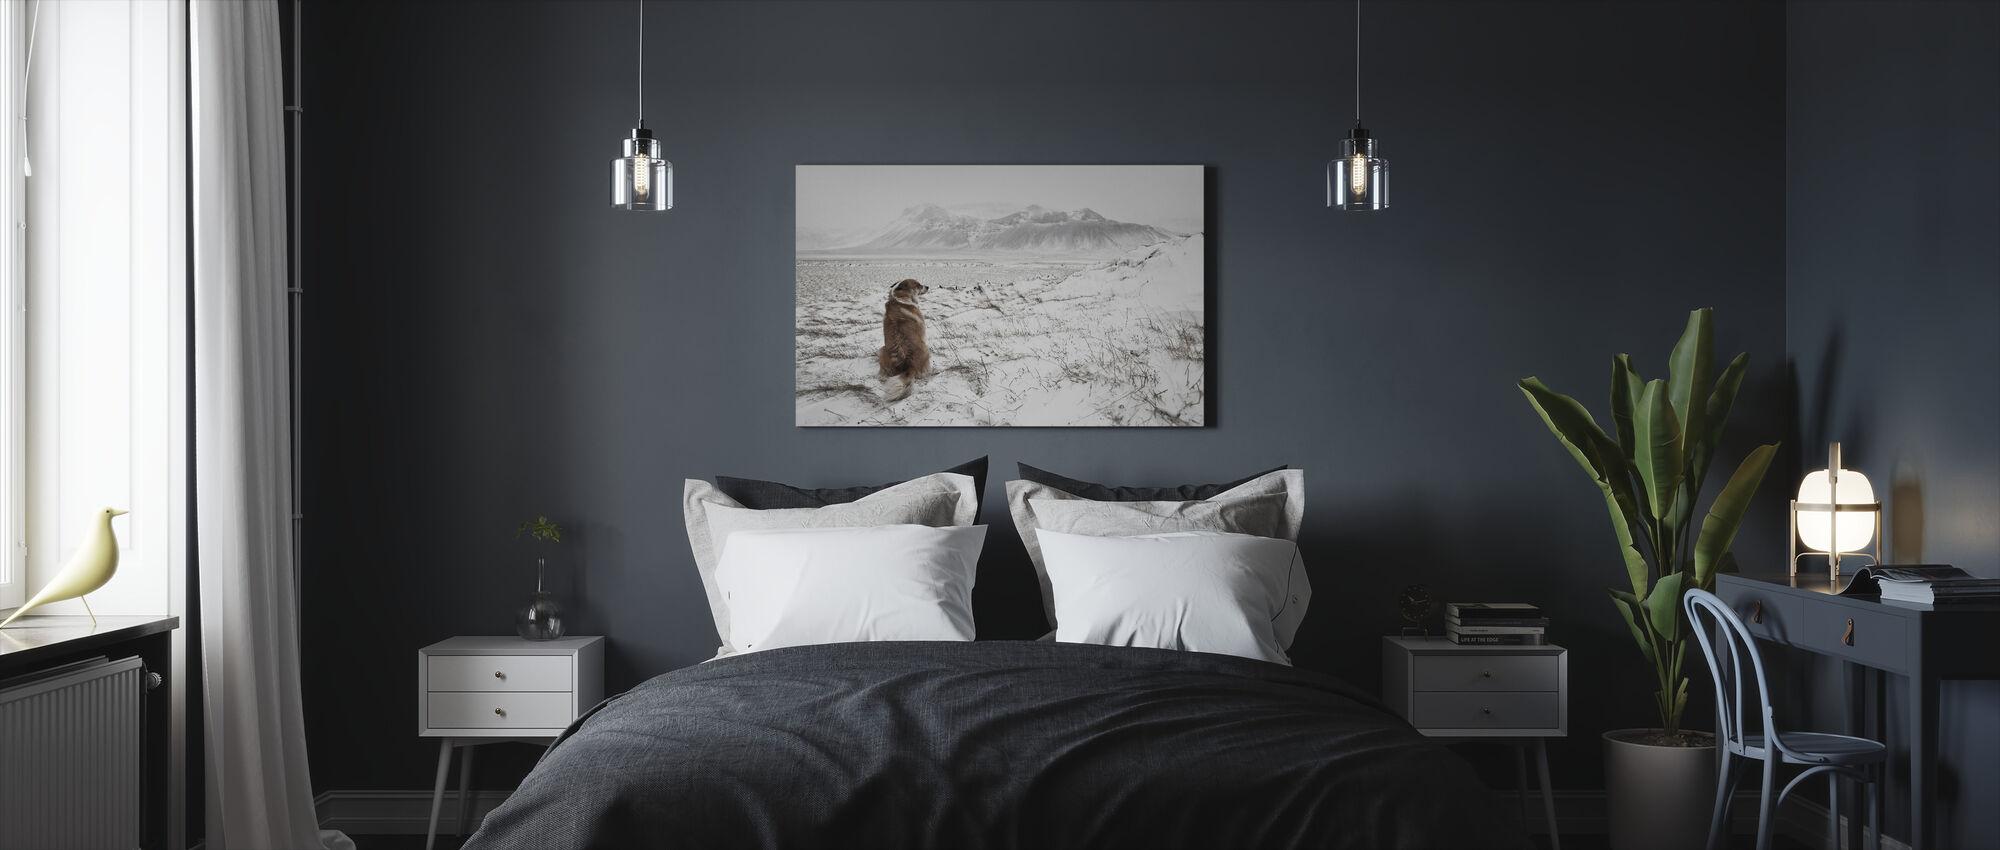 Lumimyrsky - Canvastaulu - Makuuhuone